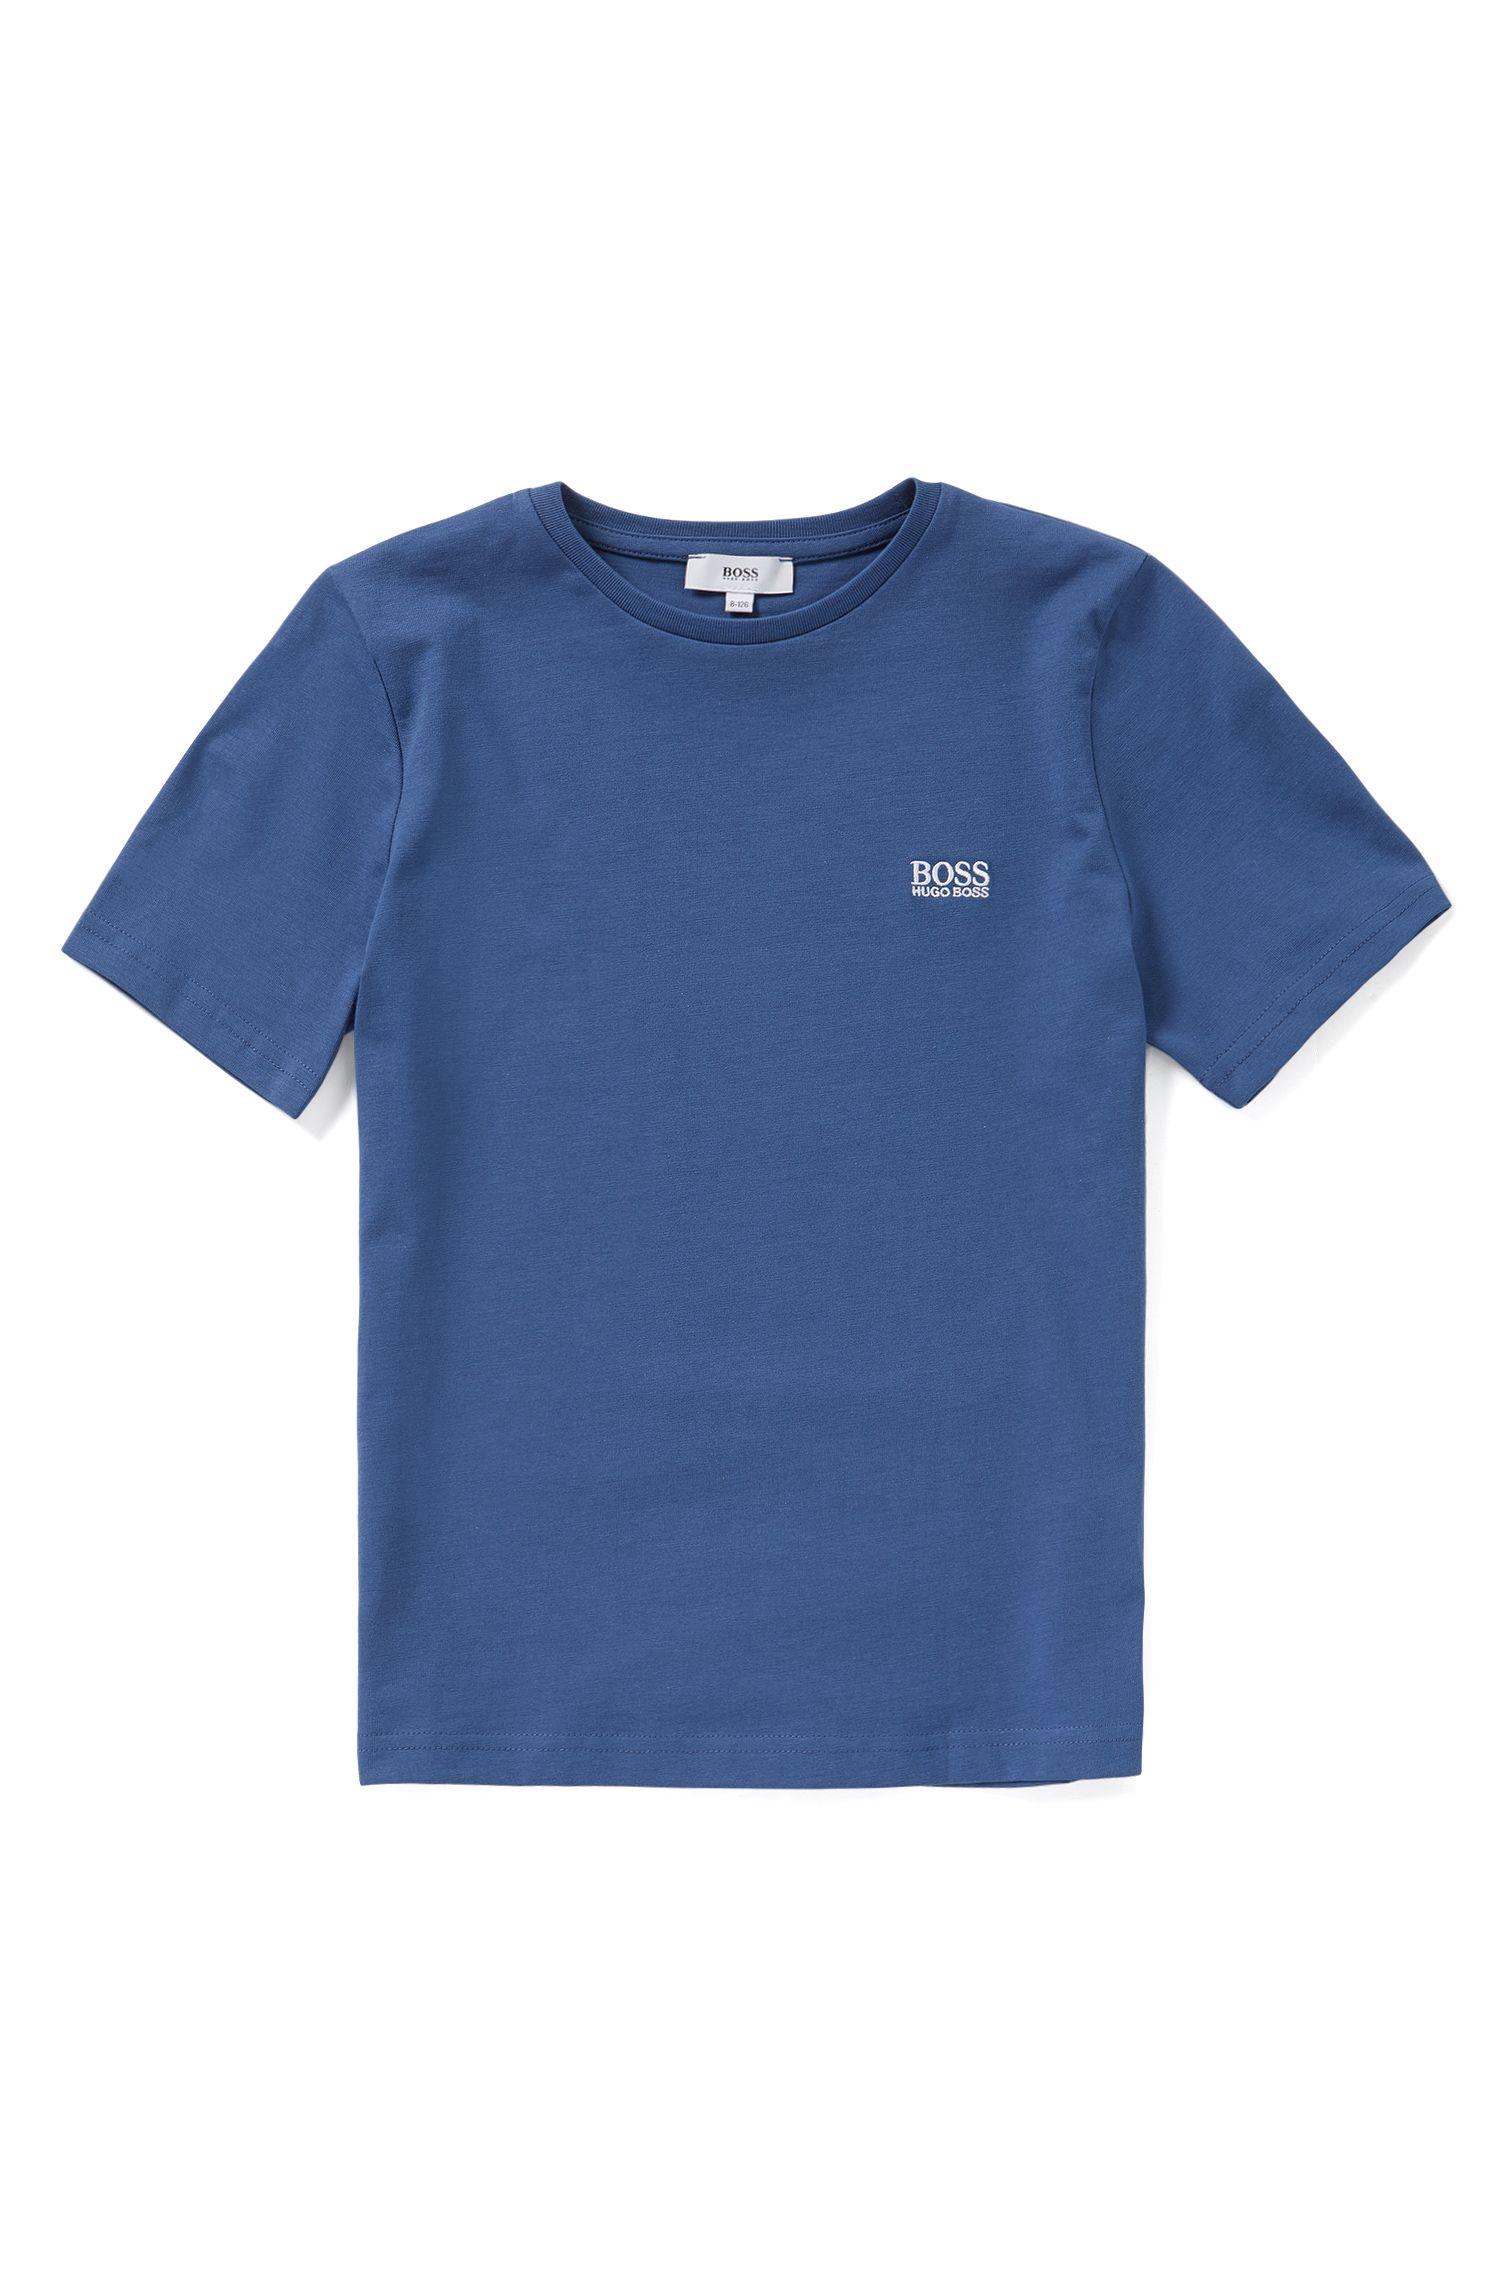 Kinder-T-shirt van stretchkatoen met ronde hals: 'J25A40'